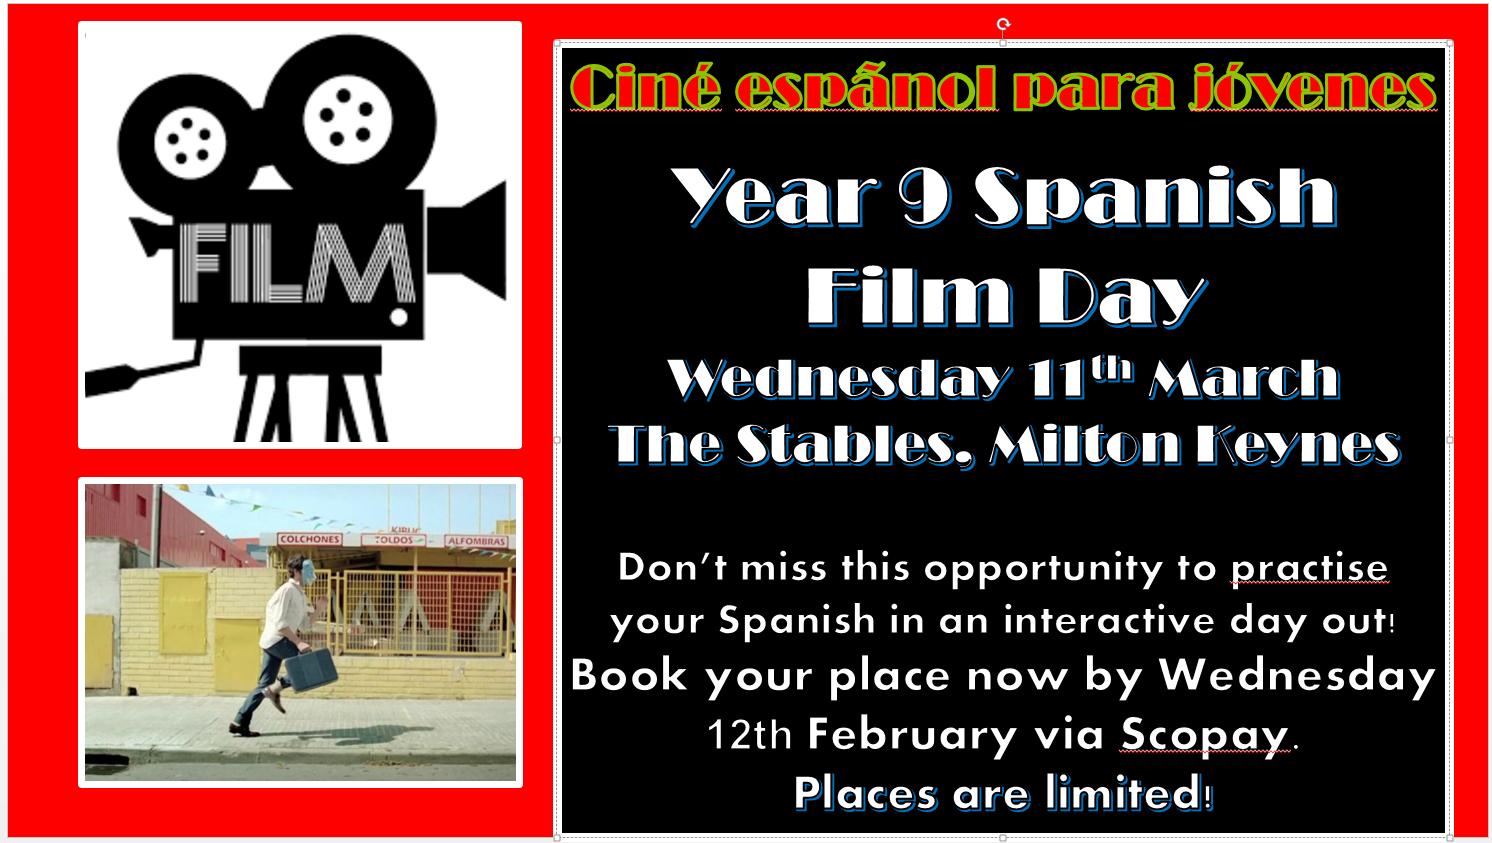 Year 9 Spanish Film trip